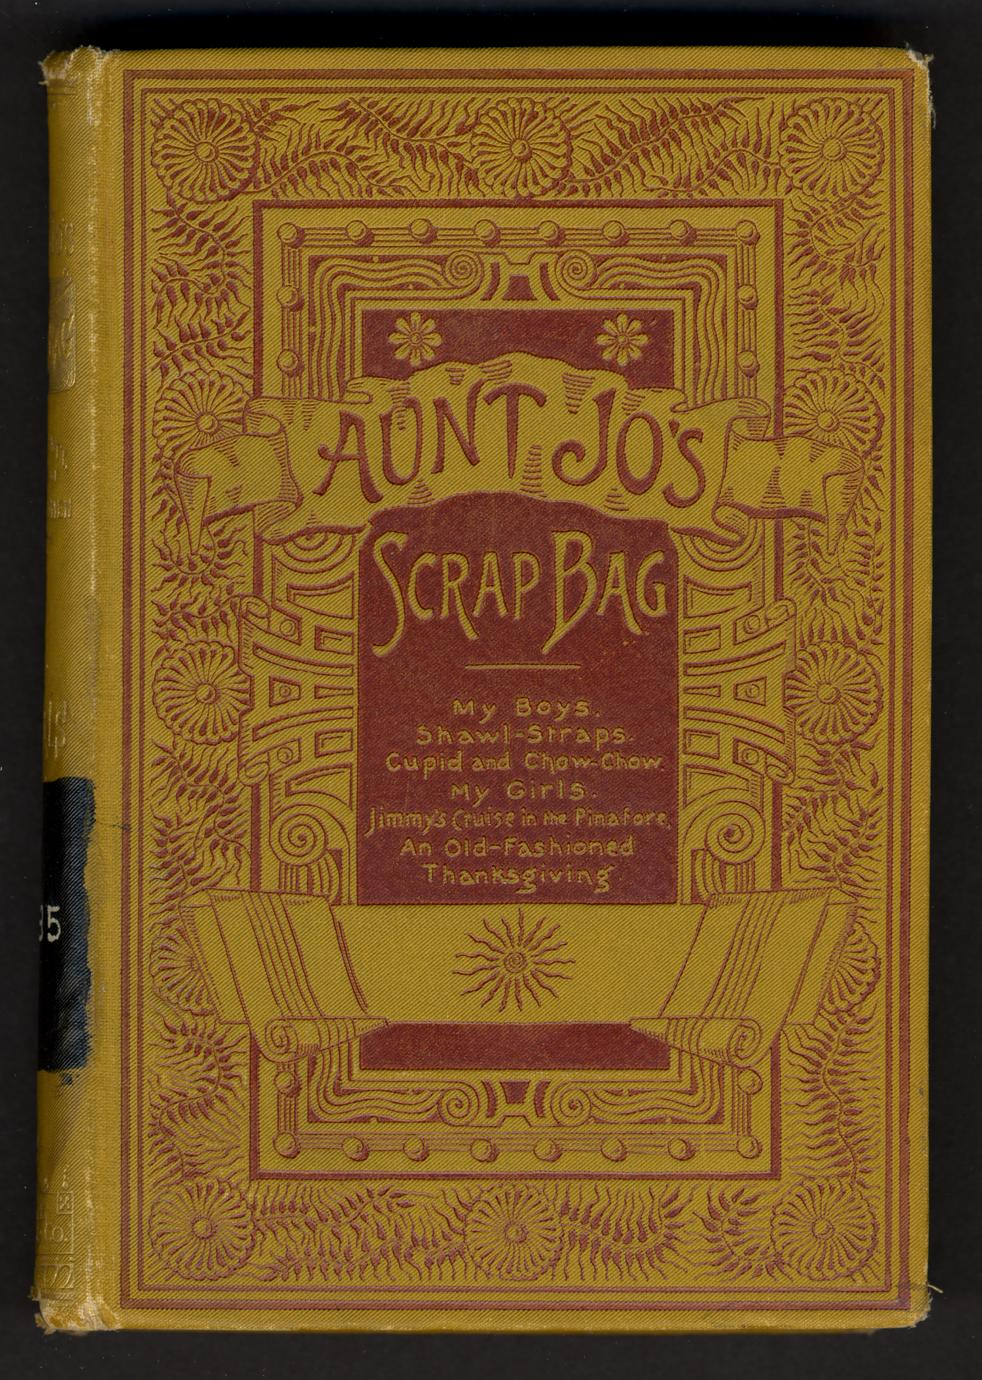 Aunt Jo's scrap bag (1 of 3)